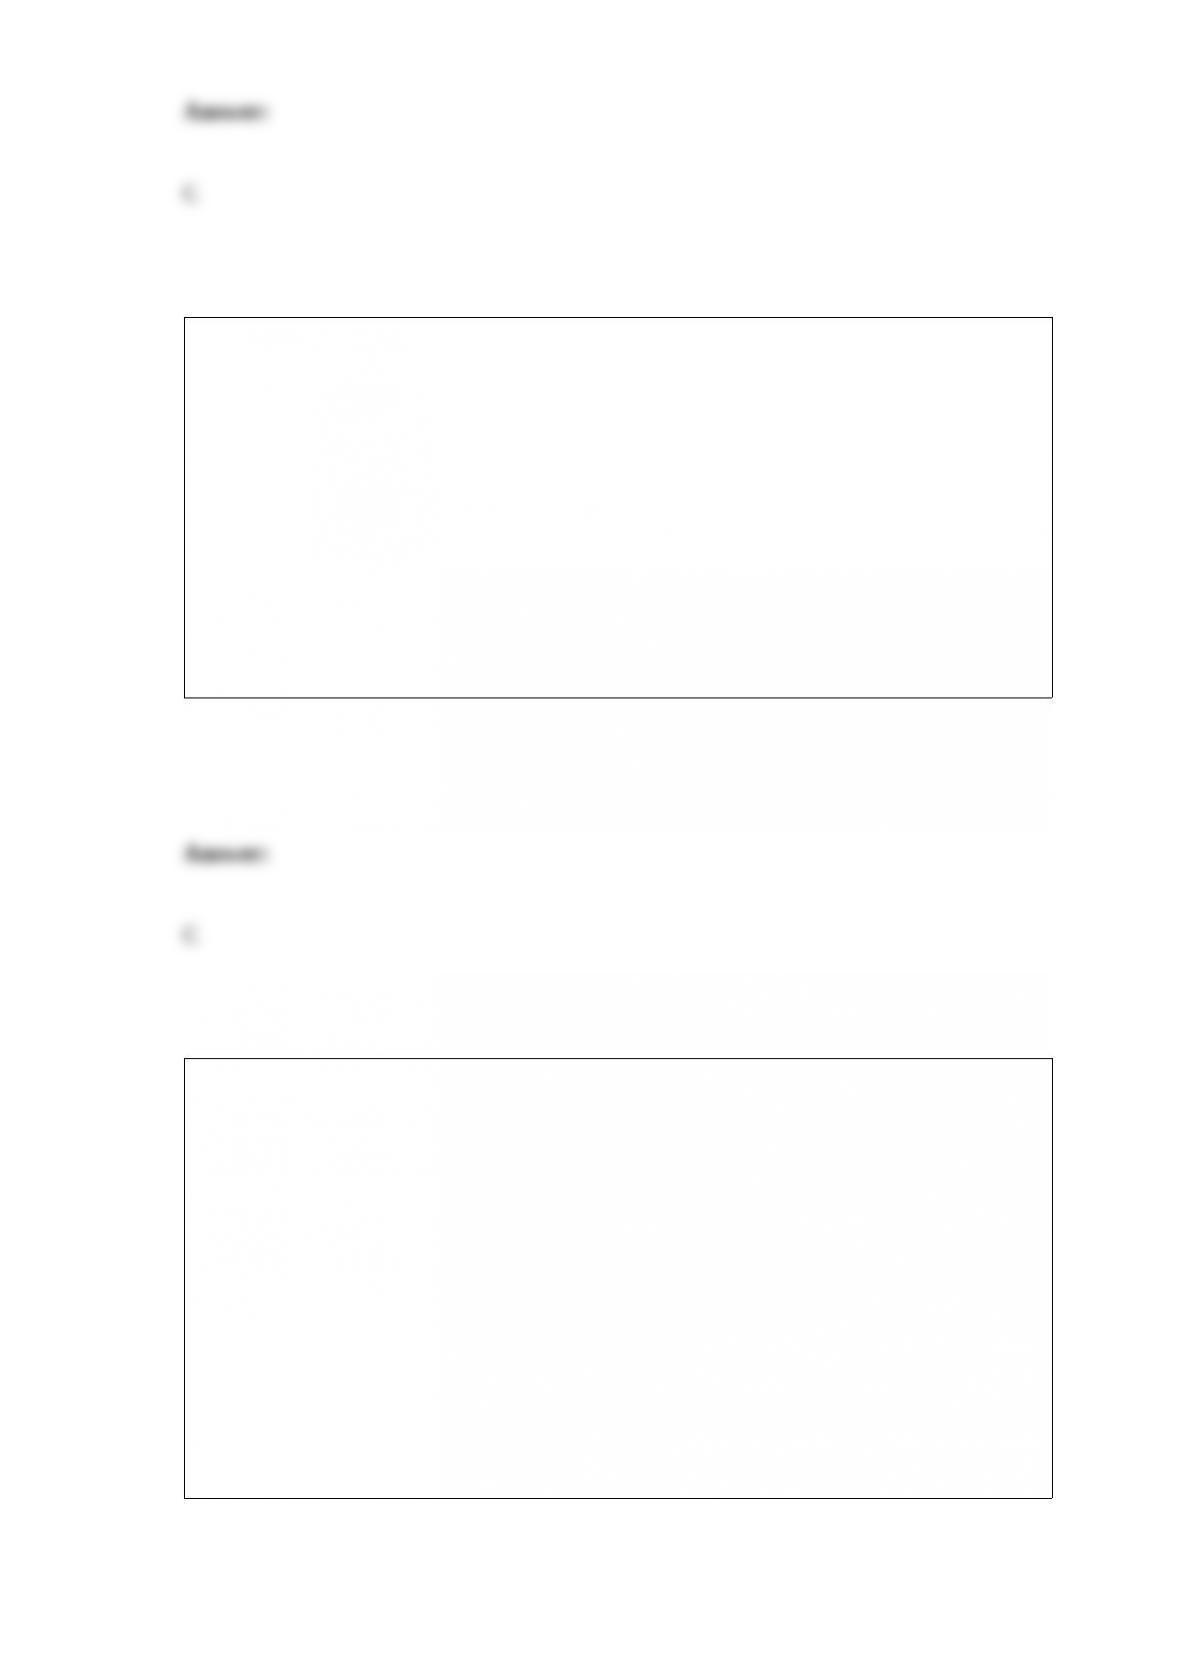 BIO 35515 | Get 24/7 Homework Help | Online Study Solutions